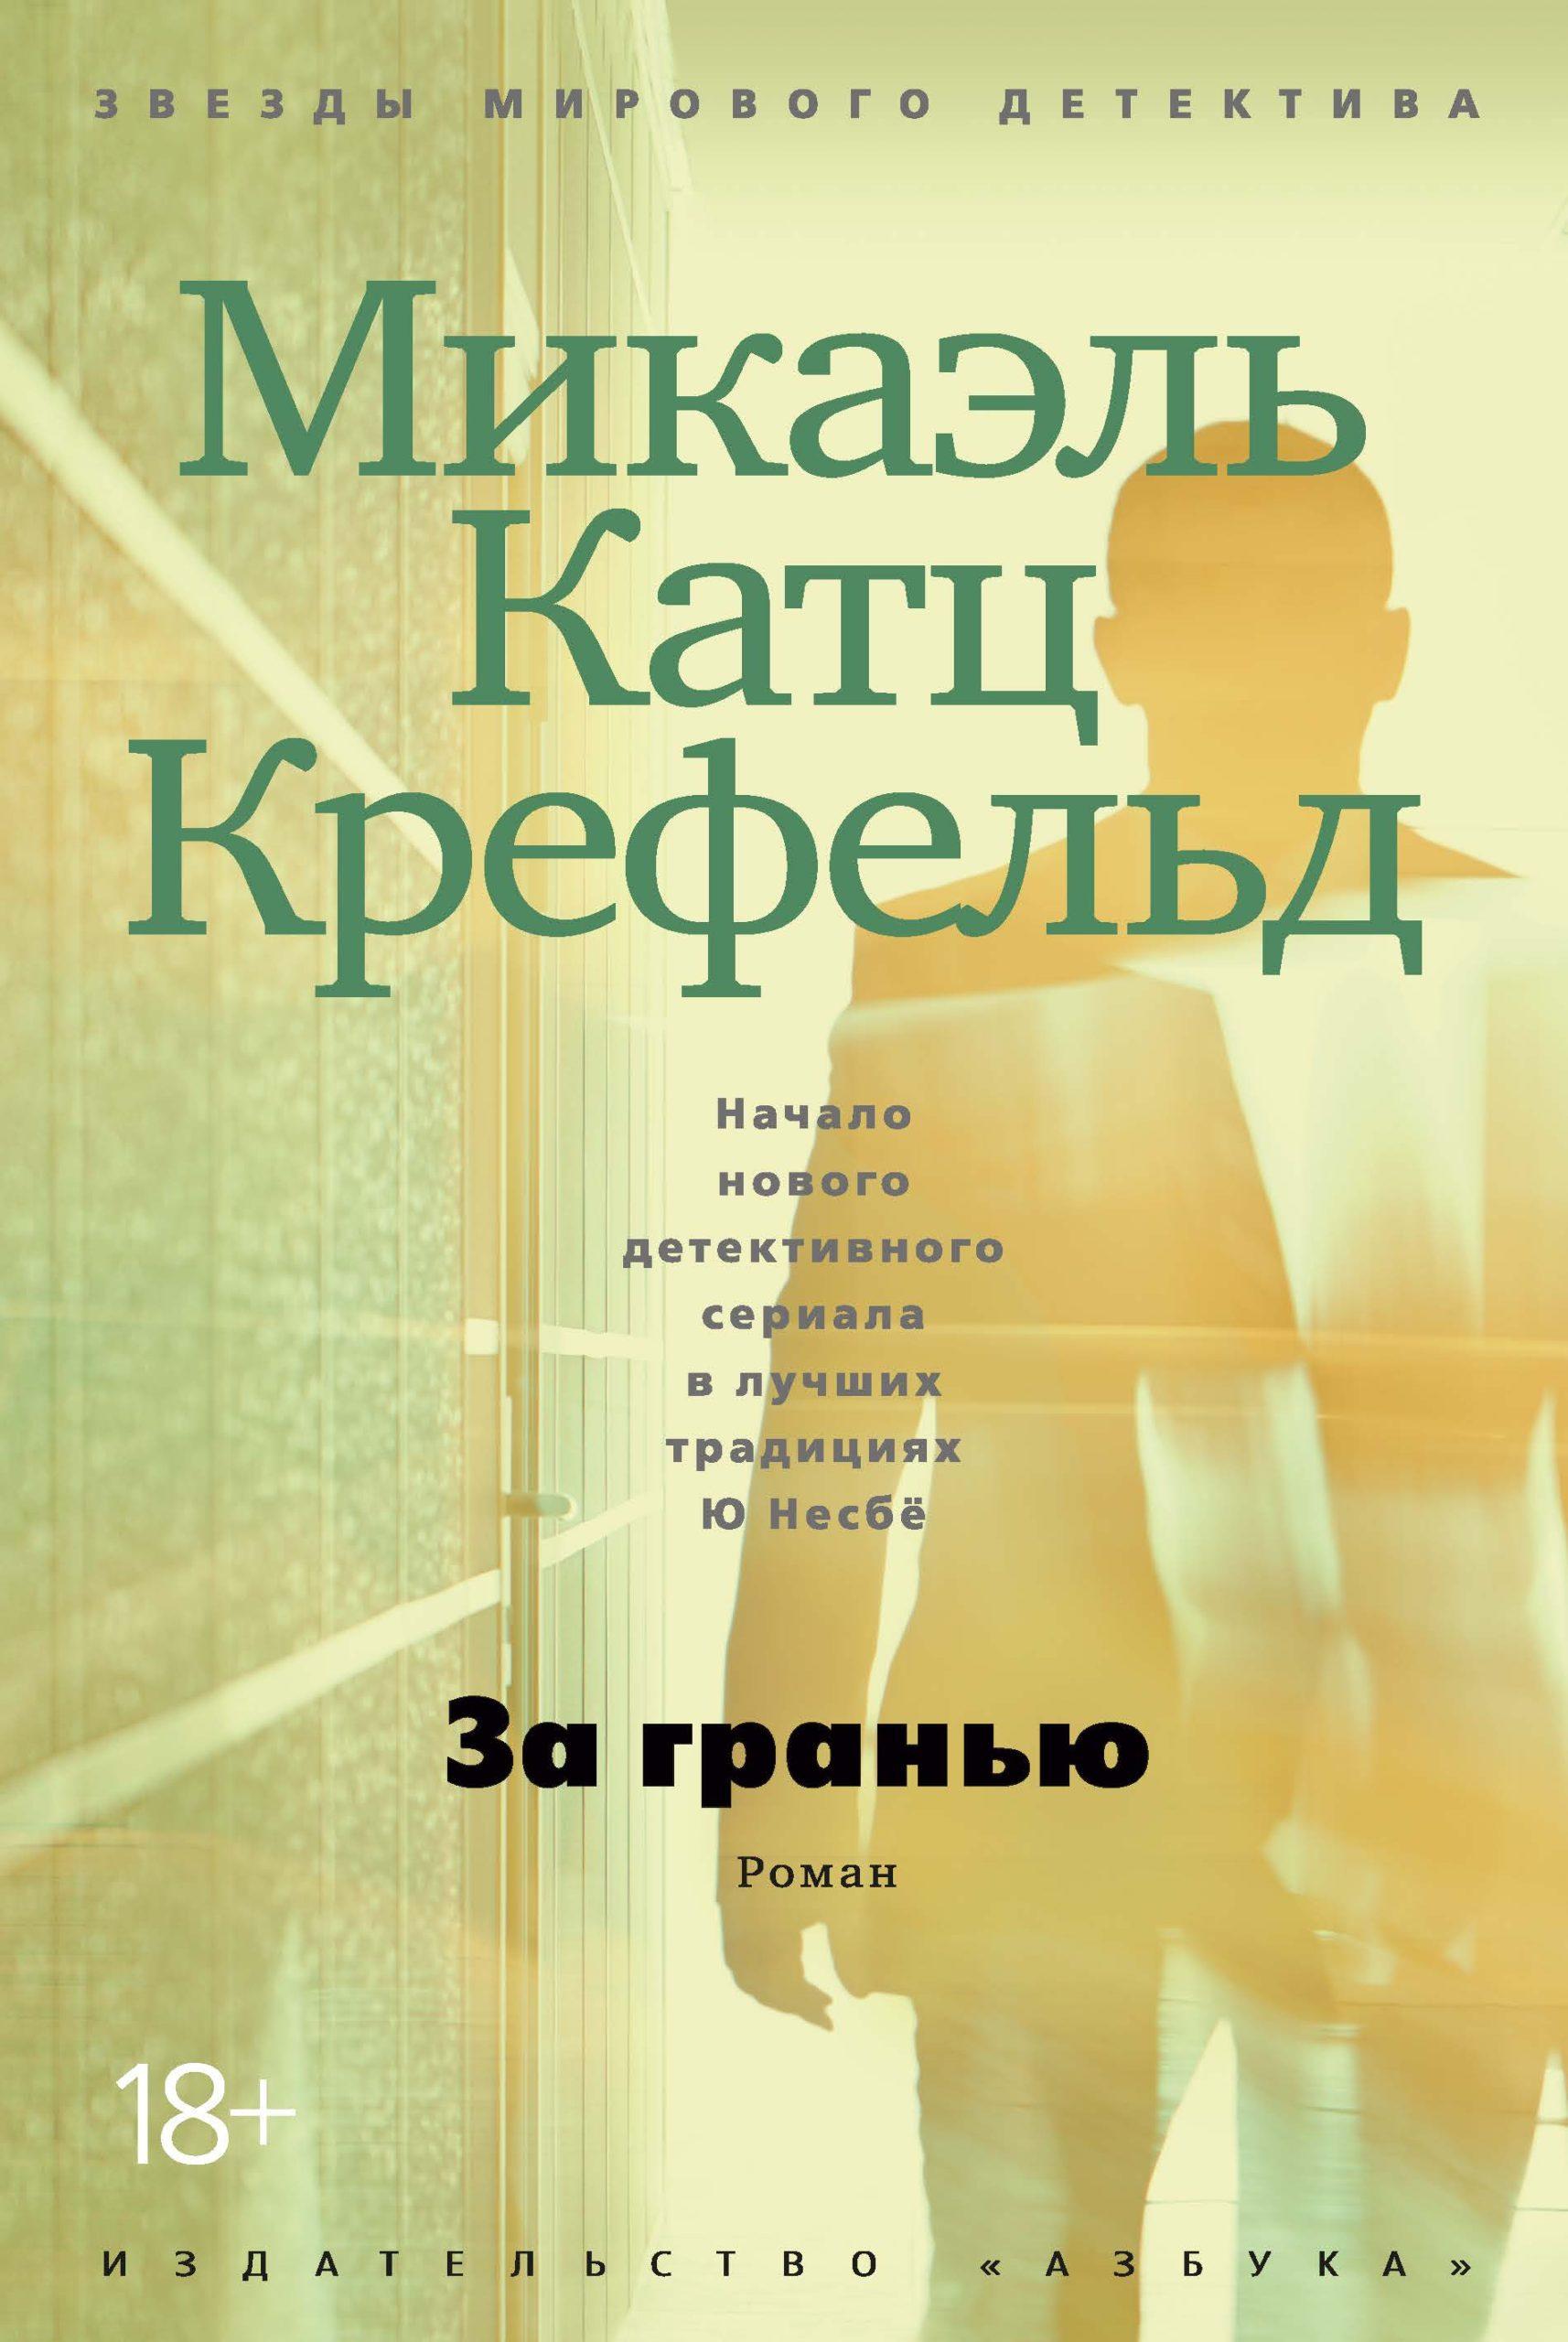 Микаэль Катц Крефельд — За гранью (2013)